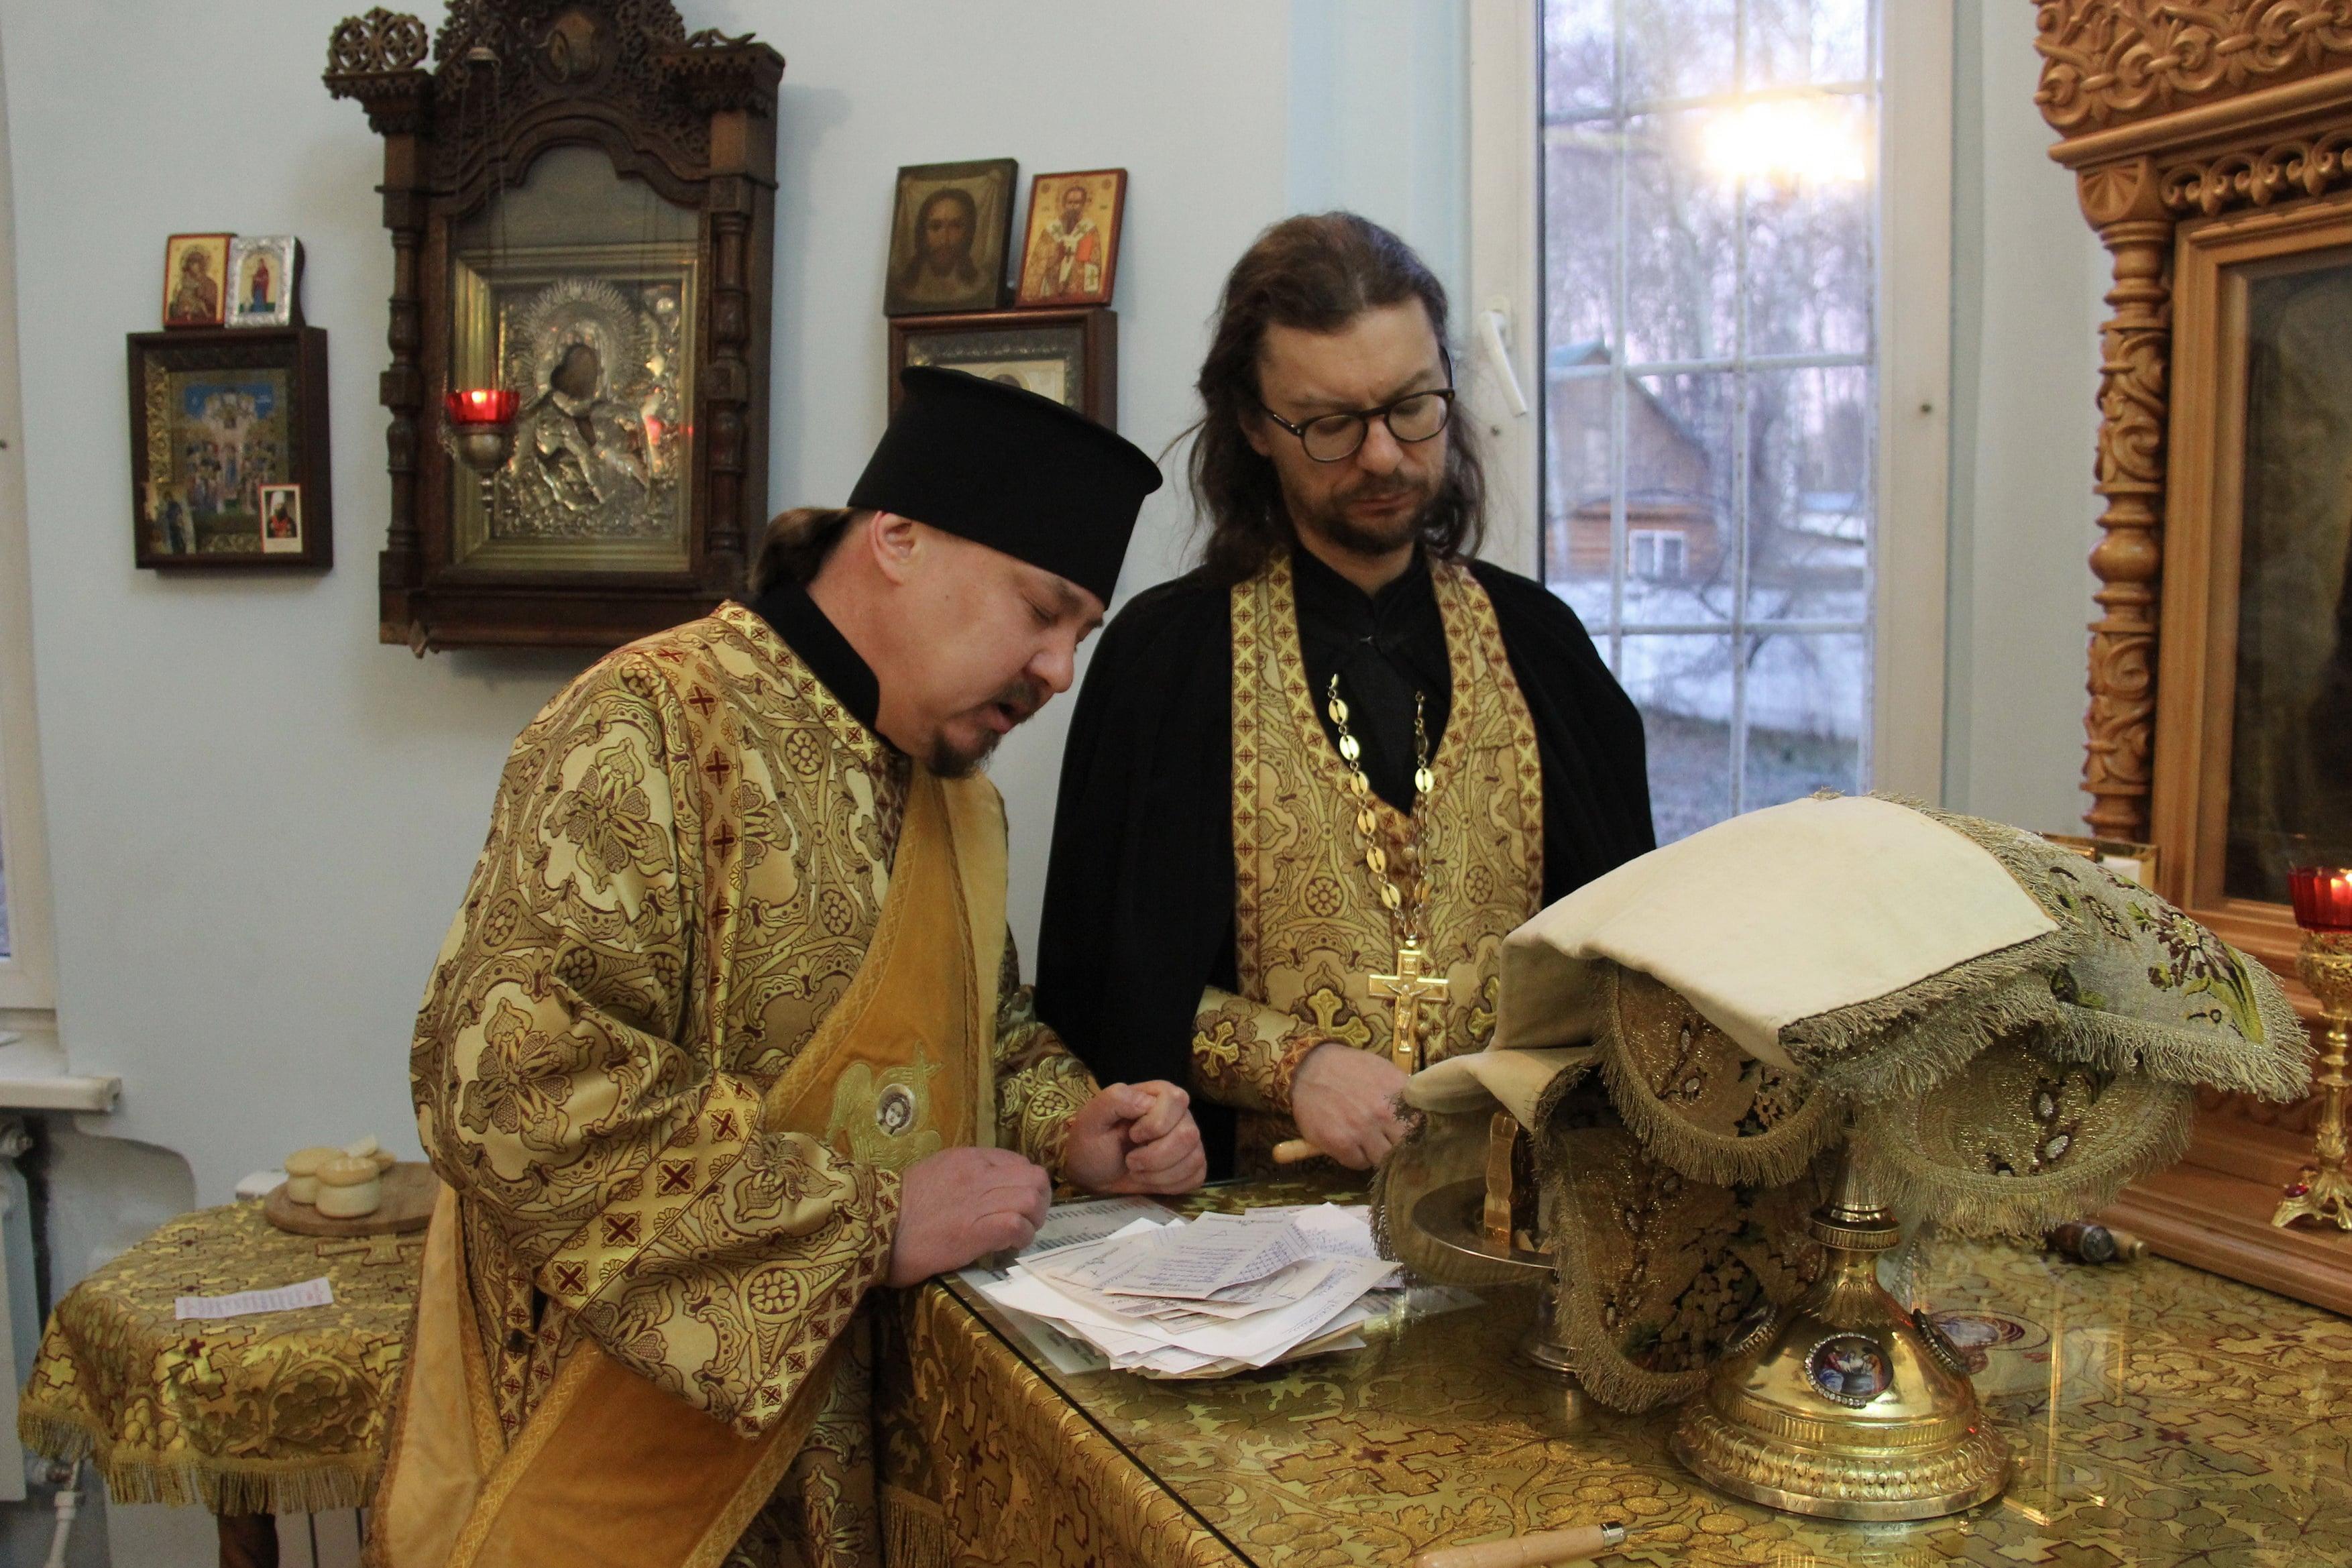 http://monuspen.ru/photoreports/ca3cfa76dabb081e45b240f799db68g1.JPG